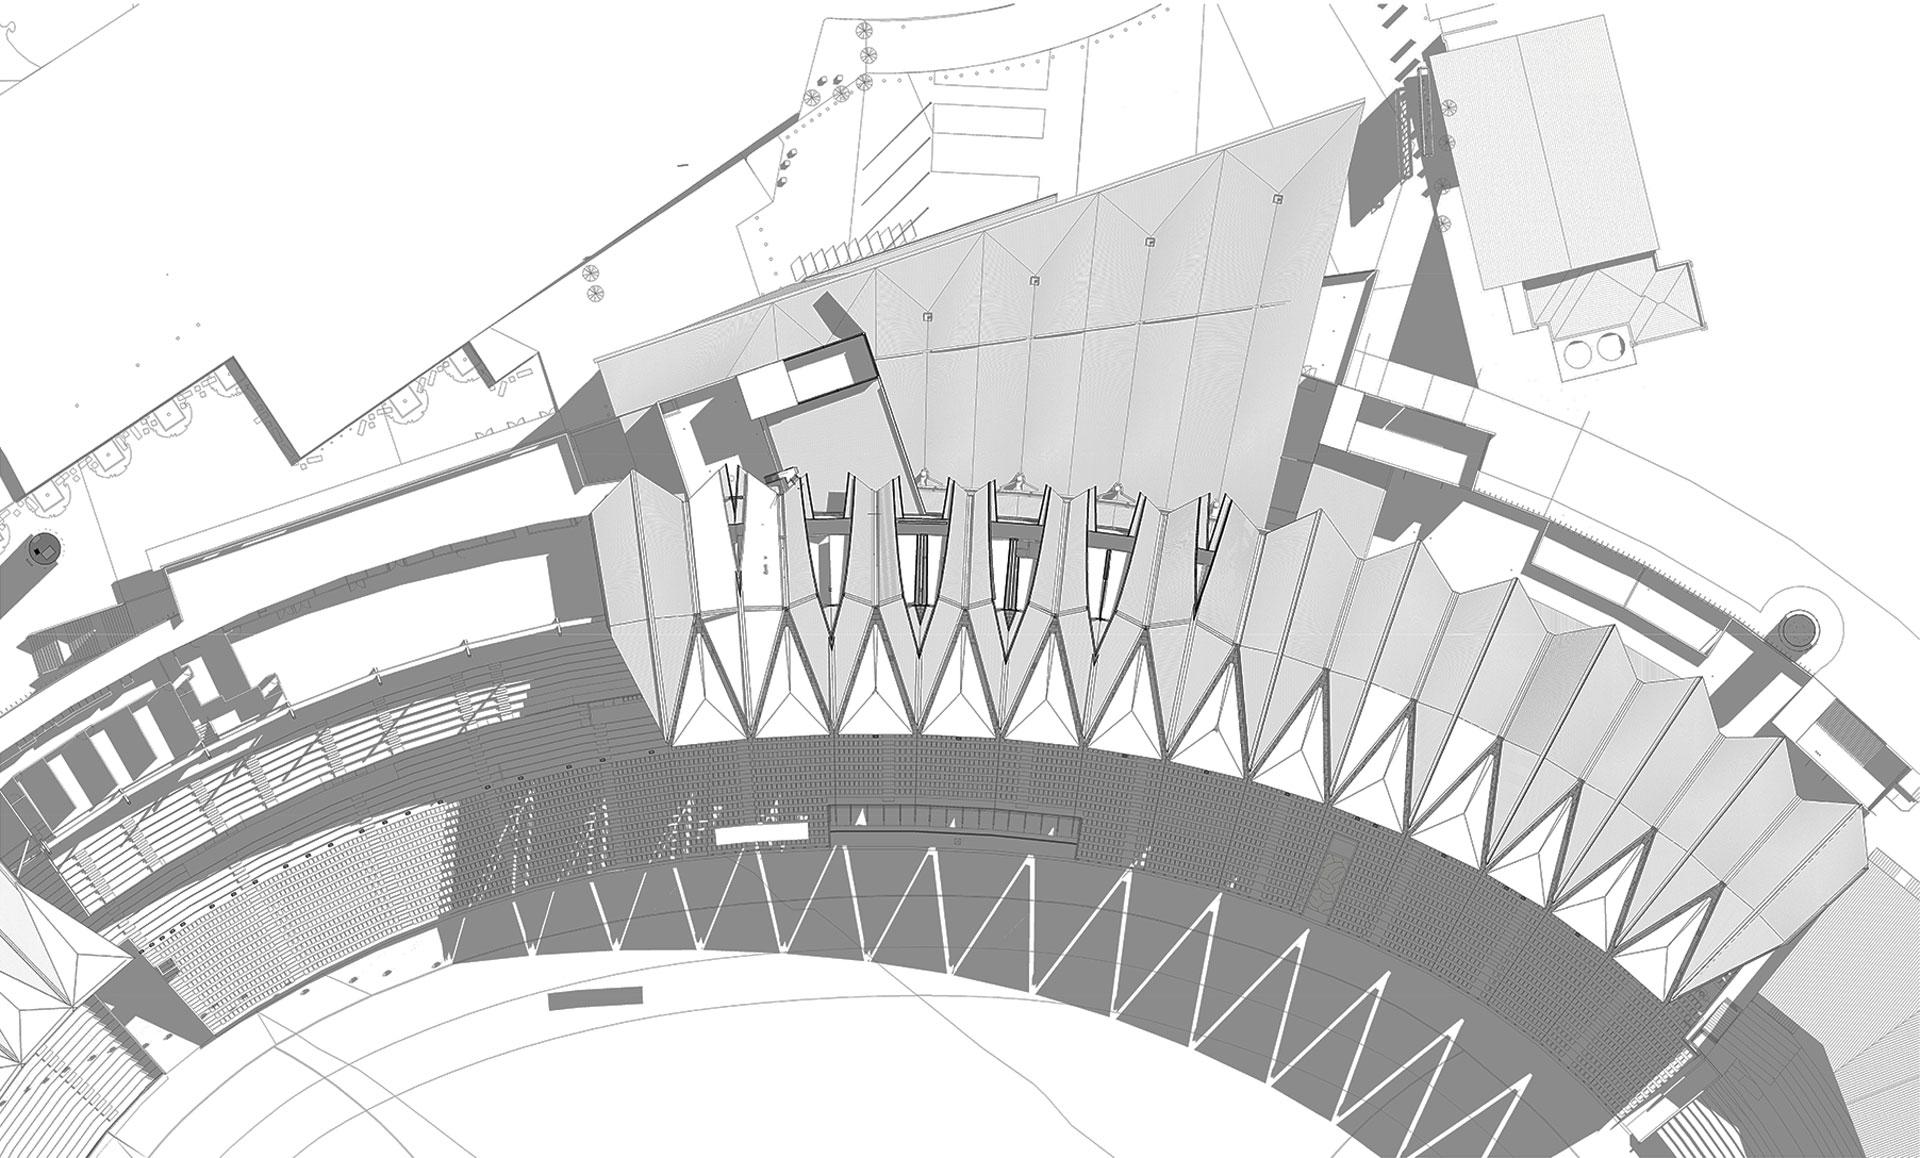 planimetry, detail